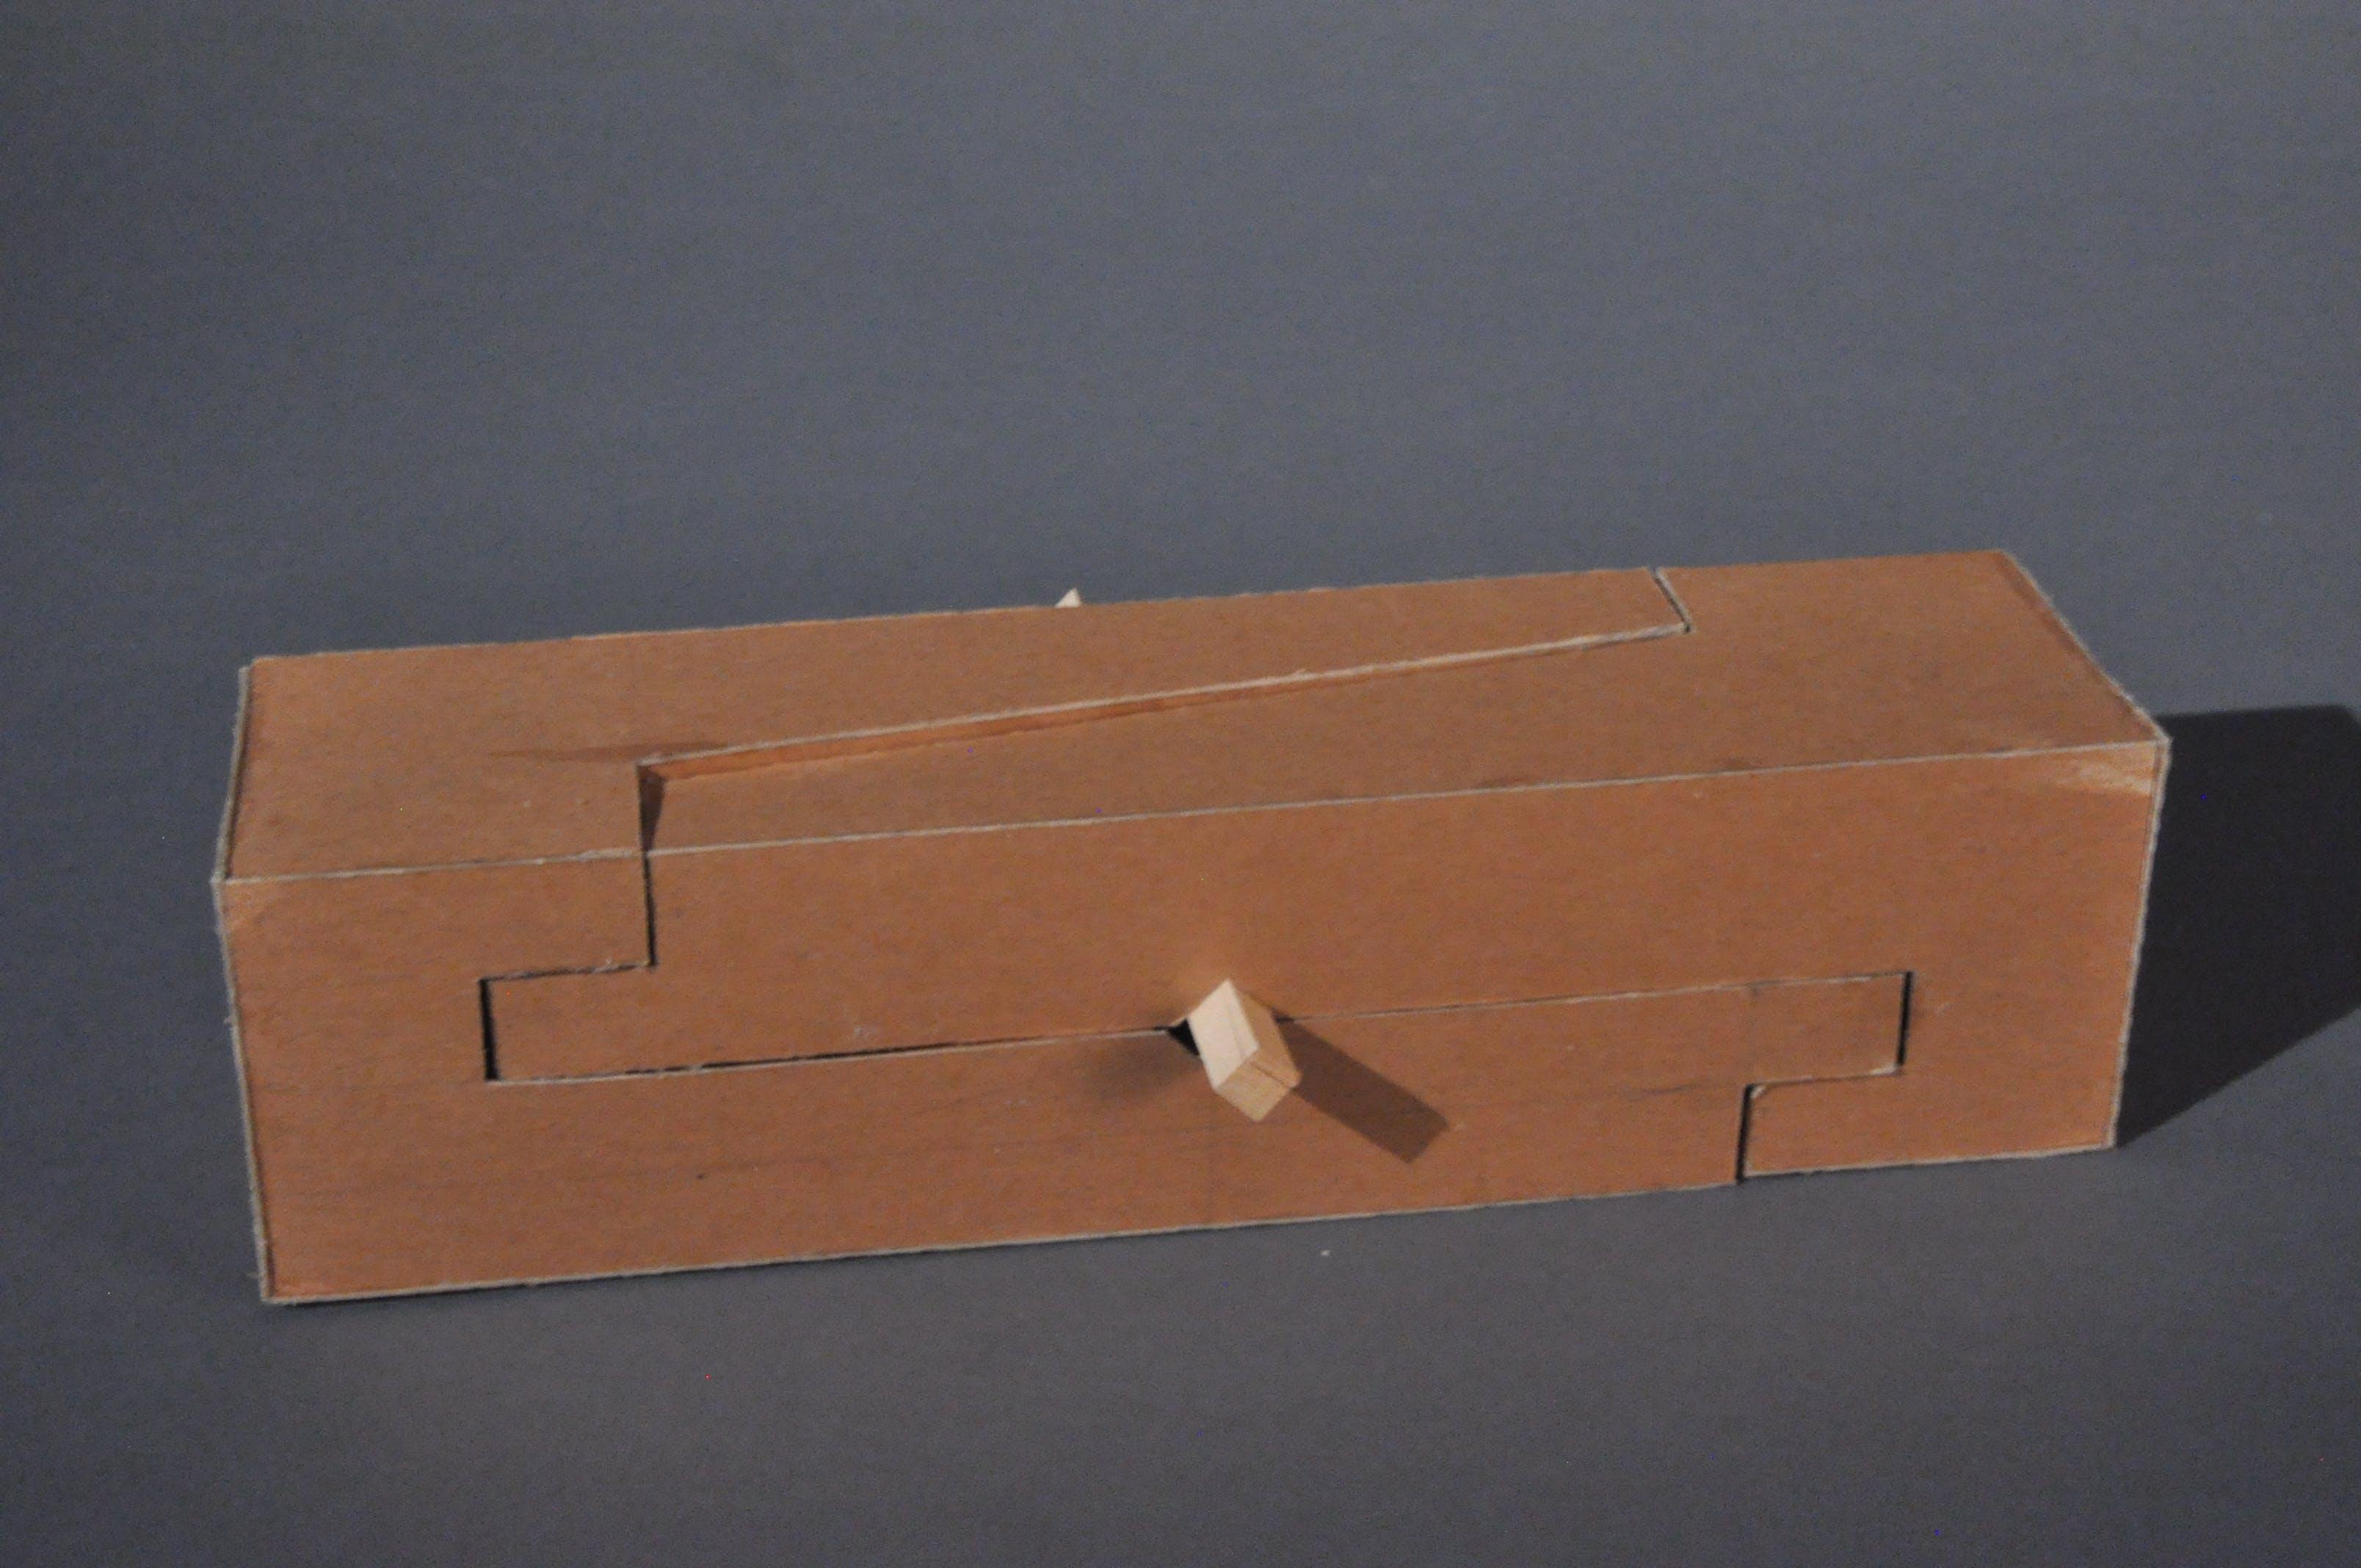 japanese joinery box. japanese joinery inspired model box